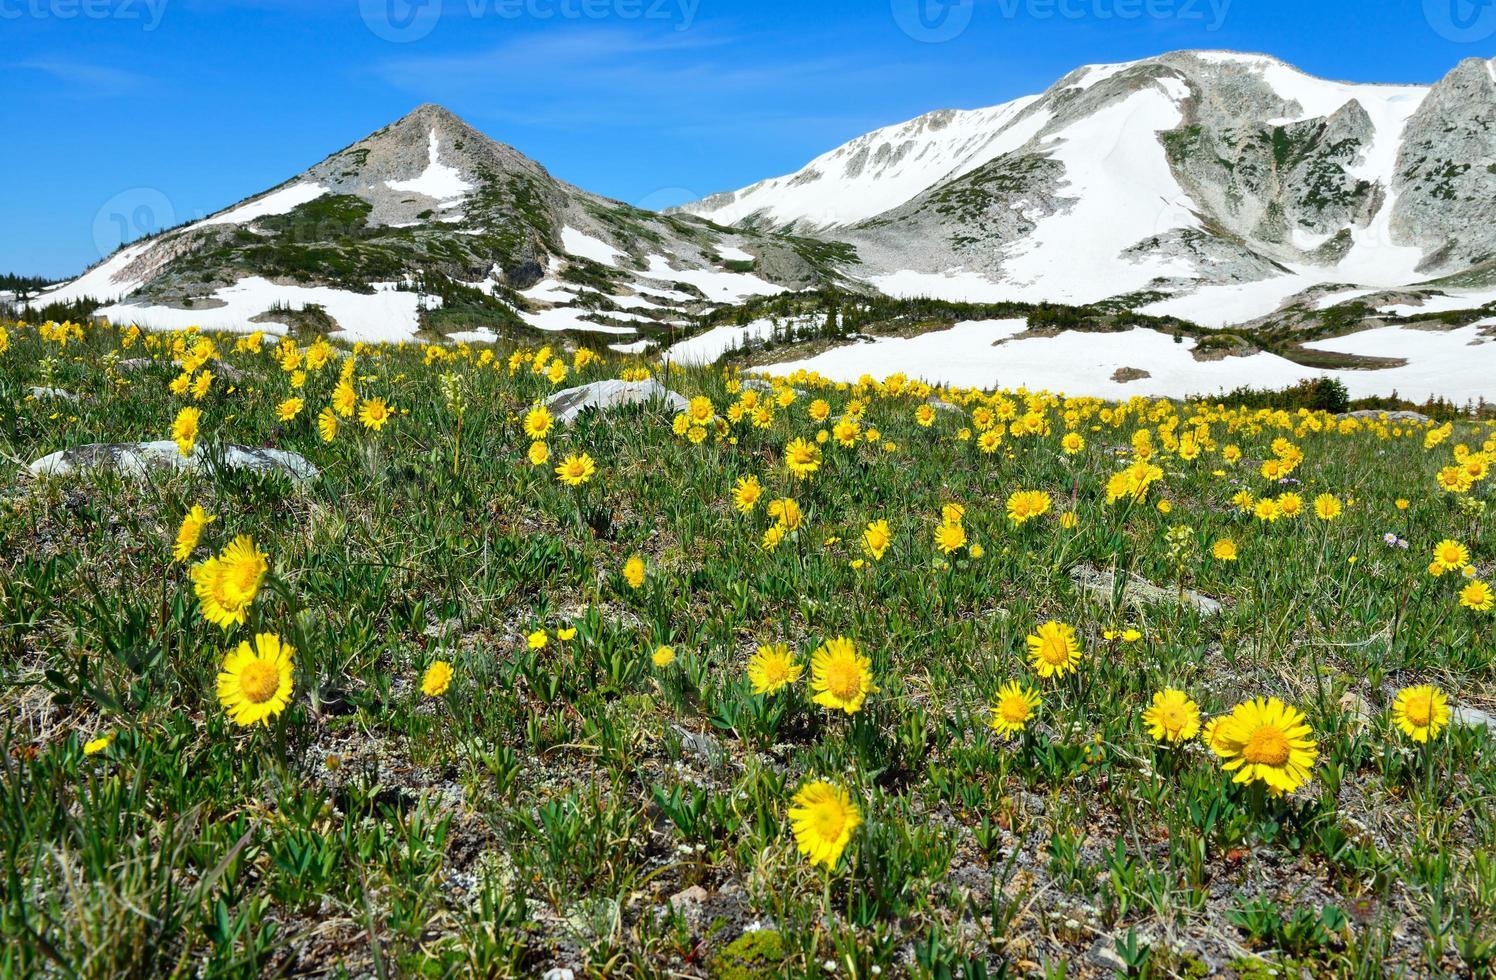 Alpine meadow with wild flowers in Snowy Range Mountains photo